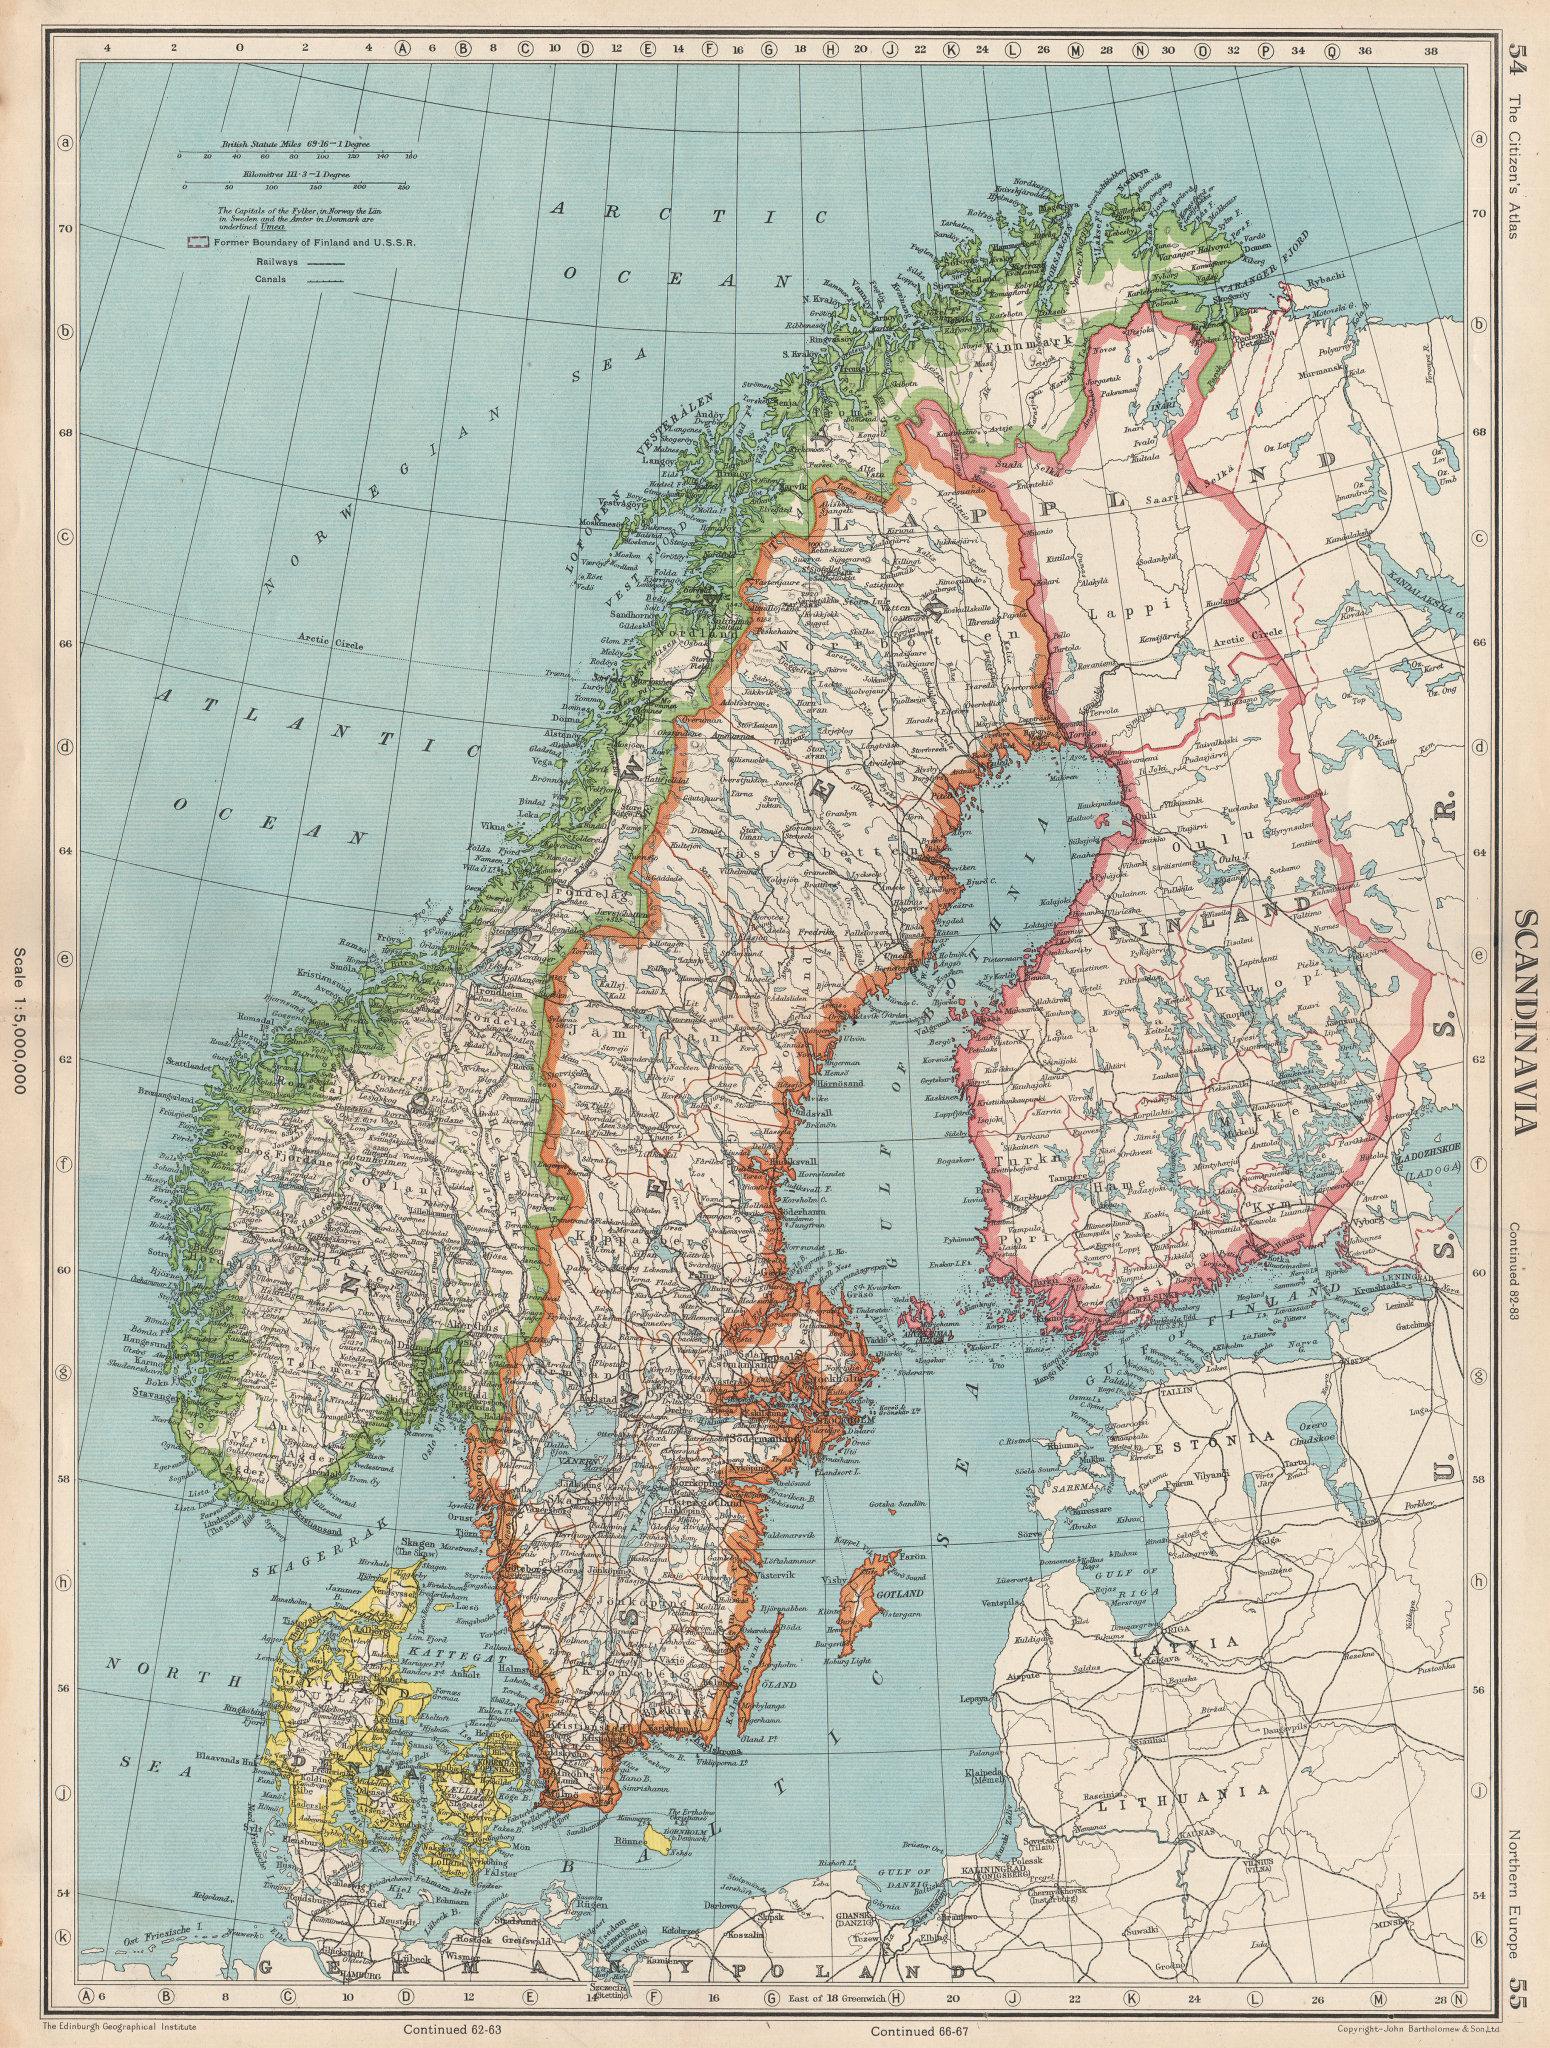 Associate Product SCANDINAVIA. Sweden Norway Denmark Finland (shows < 1940 borders)  1952 map